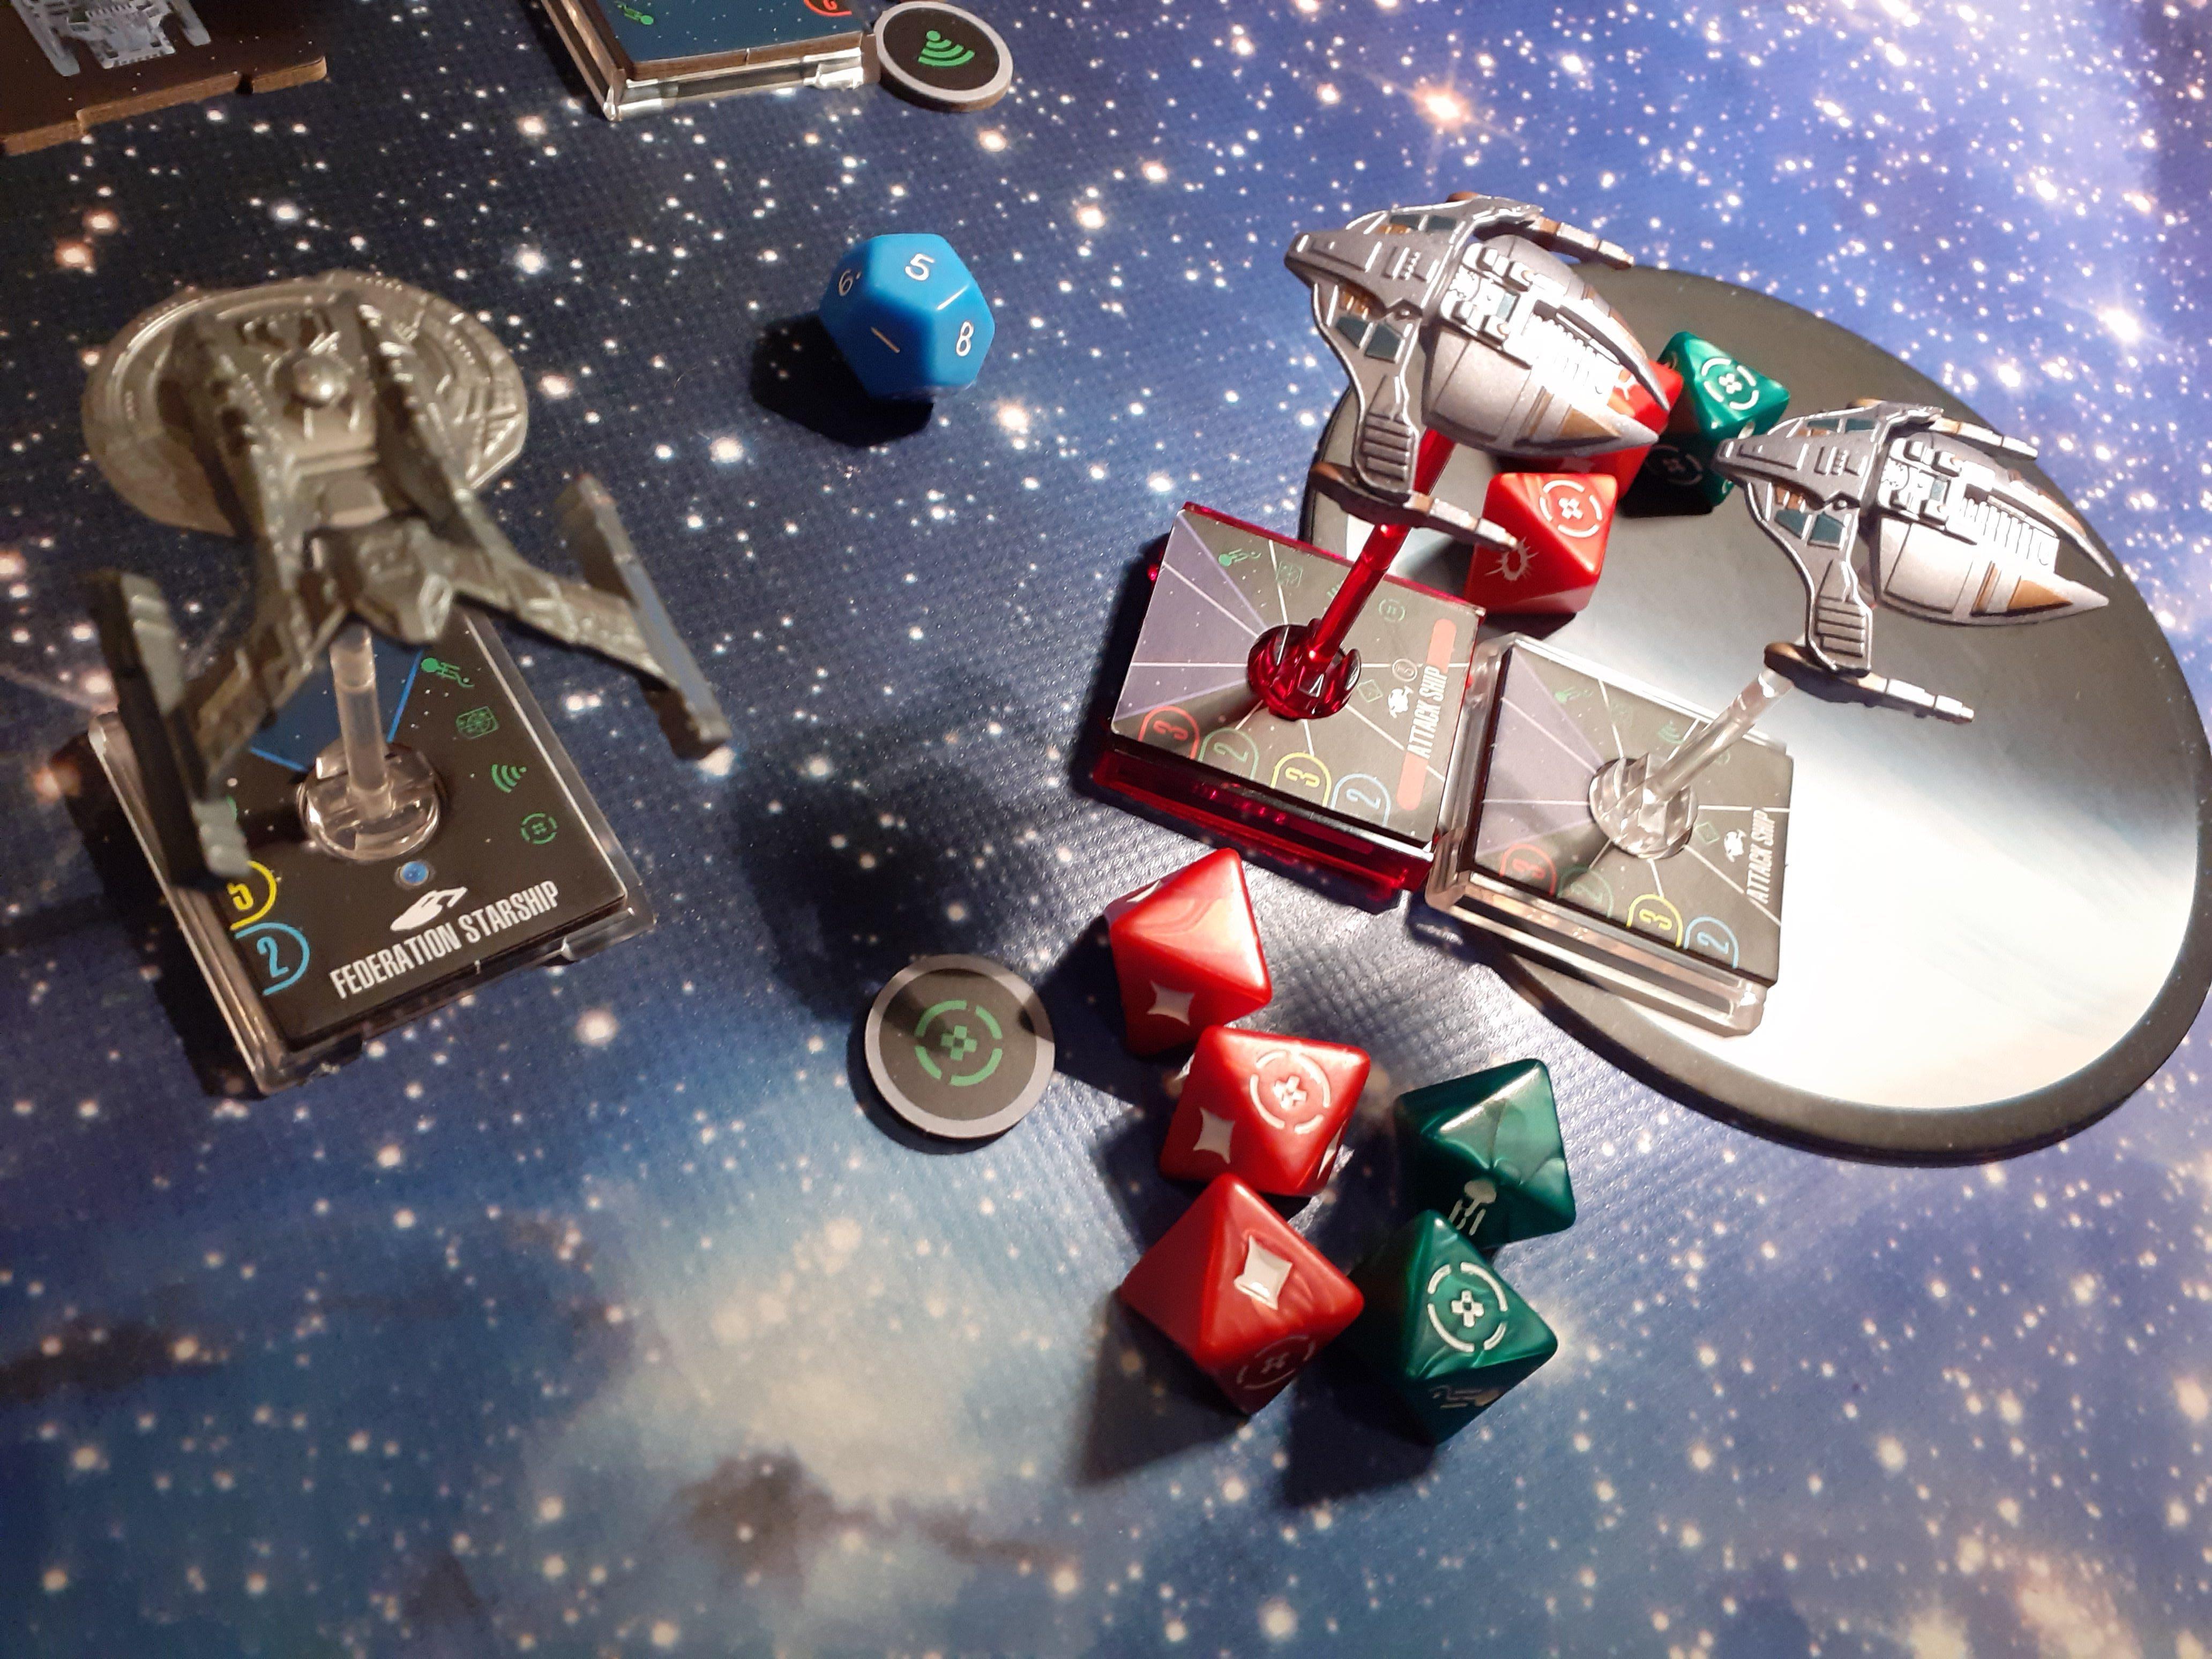 [Star Trek Alliance - Dominion War Campaign I] Computerlogbuch der Solo-Kampagne von Commander Cut  20210403_015745-e1617448546414